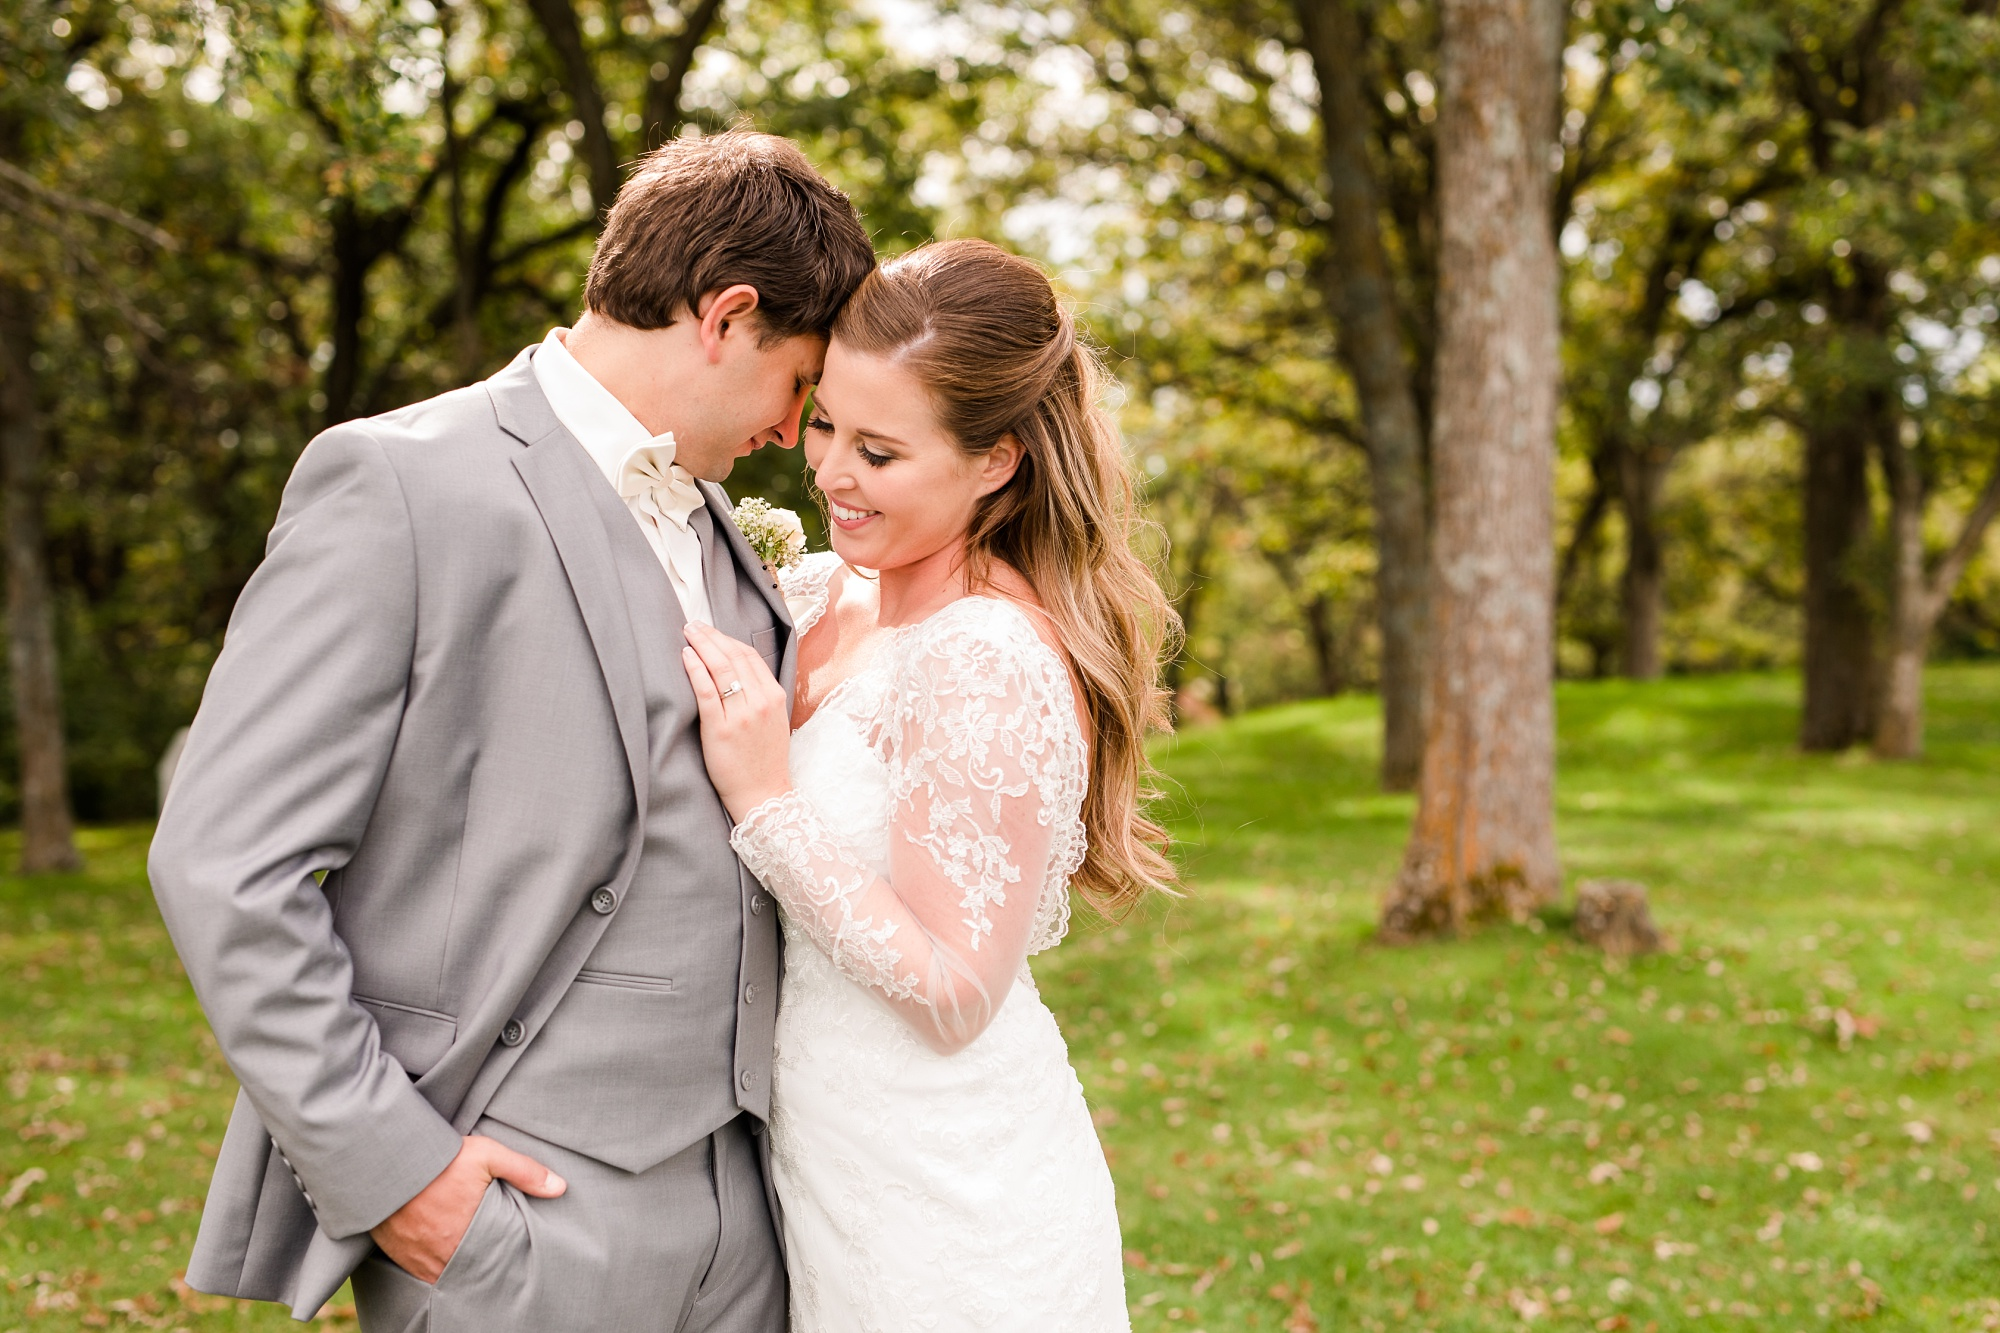 AmberLangerudPhotography_Fair Hills Resort Lakeside Wedding in Minnesota_3436.jpg